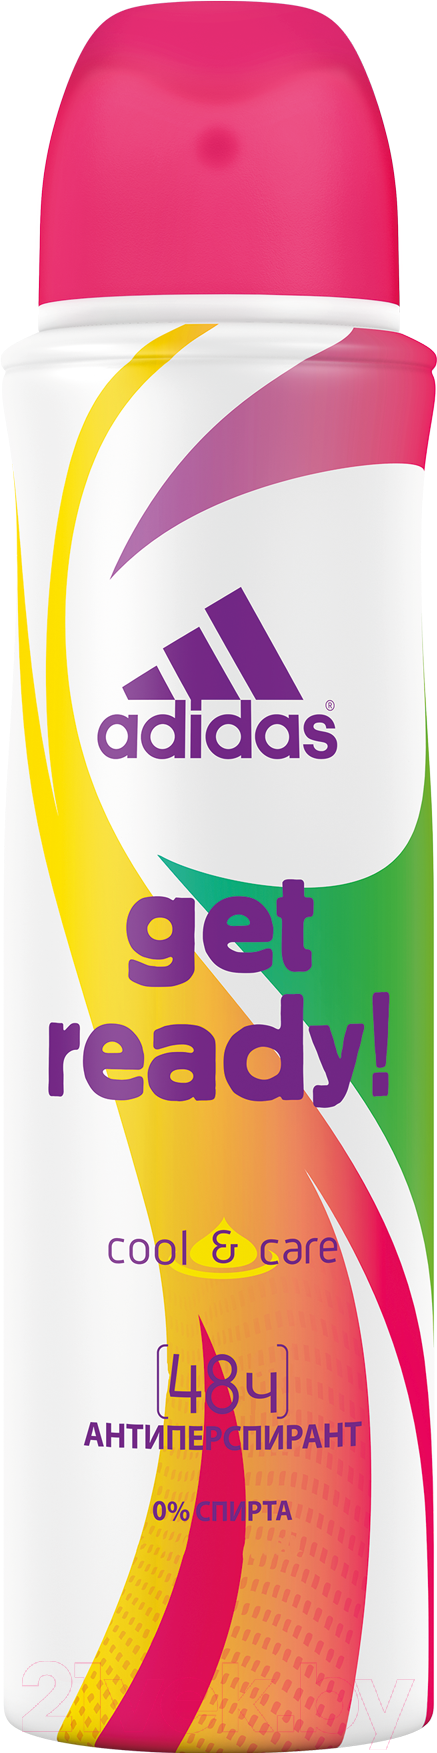 Купить Дезодорант-спрей Adidas, Cool&Care Get Ready (150мл), Португалия